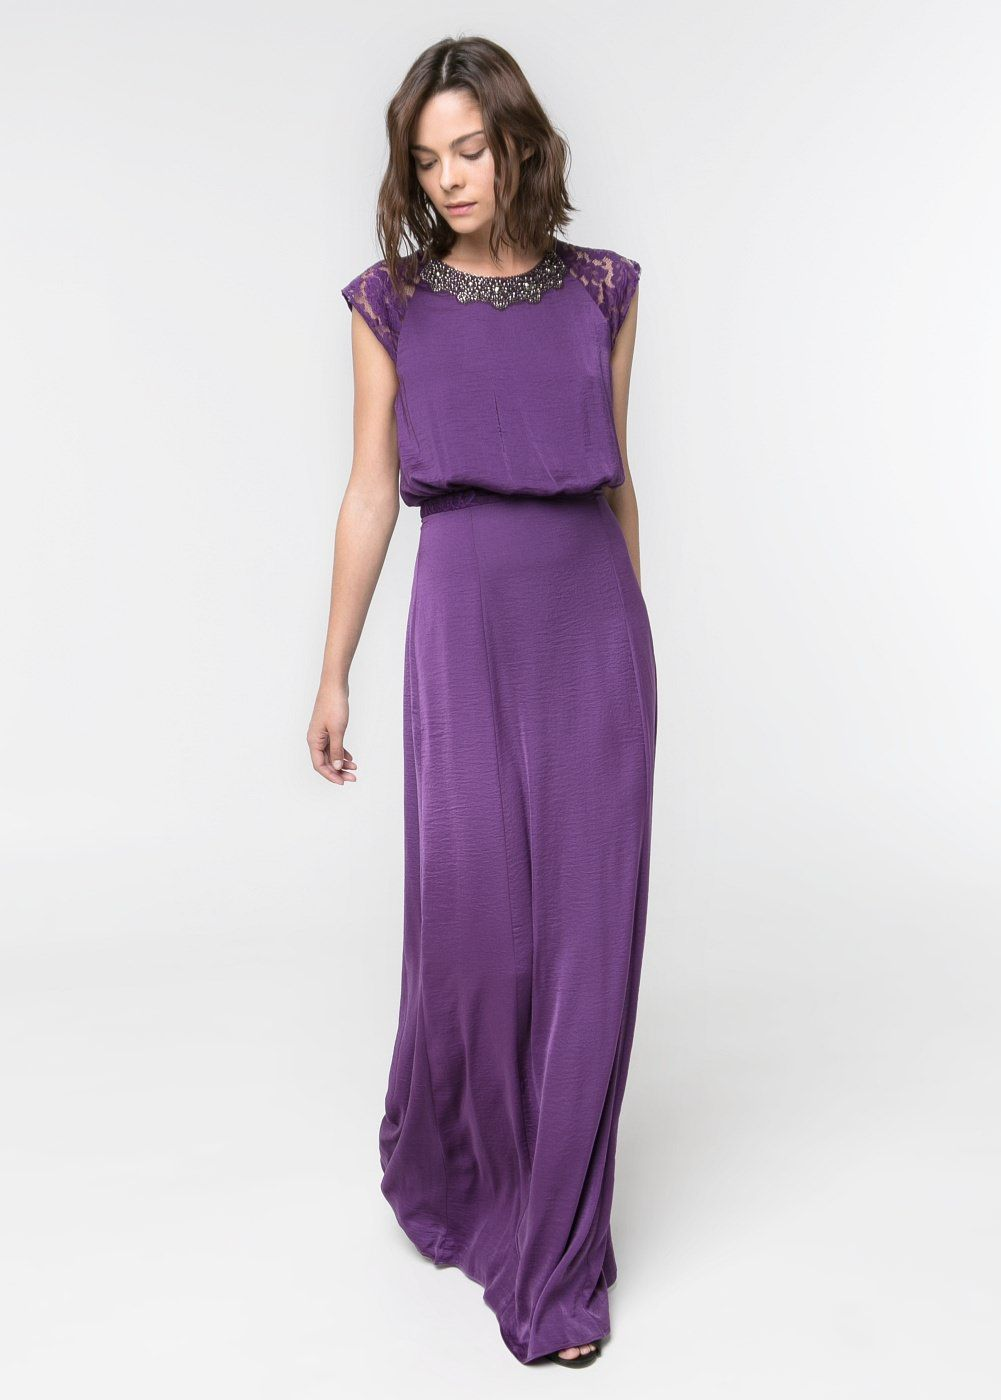 MNG - Purple - Dress | That Dress! | Pinterest | Abalorios ...